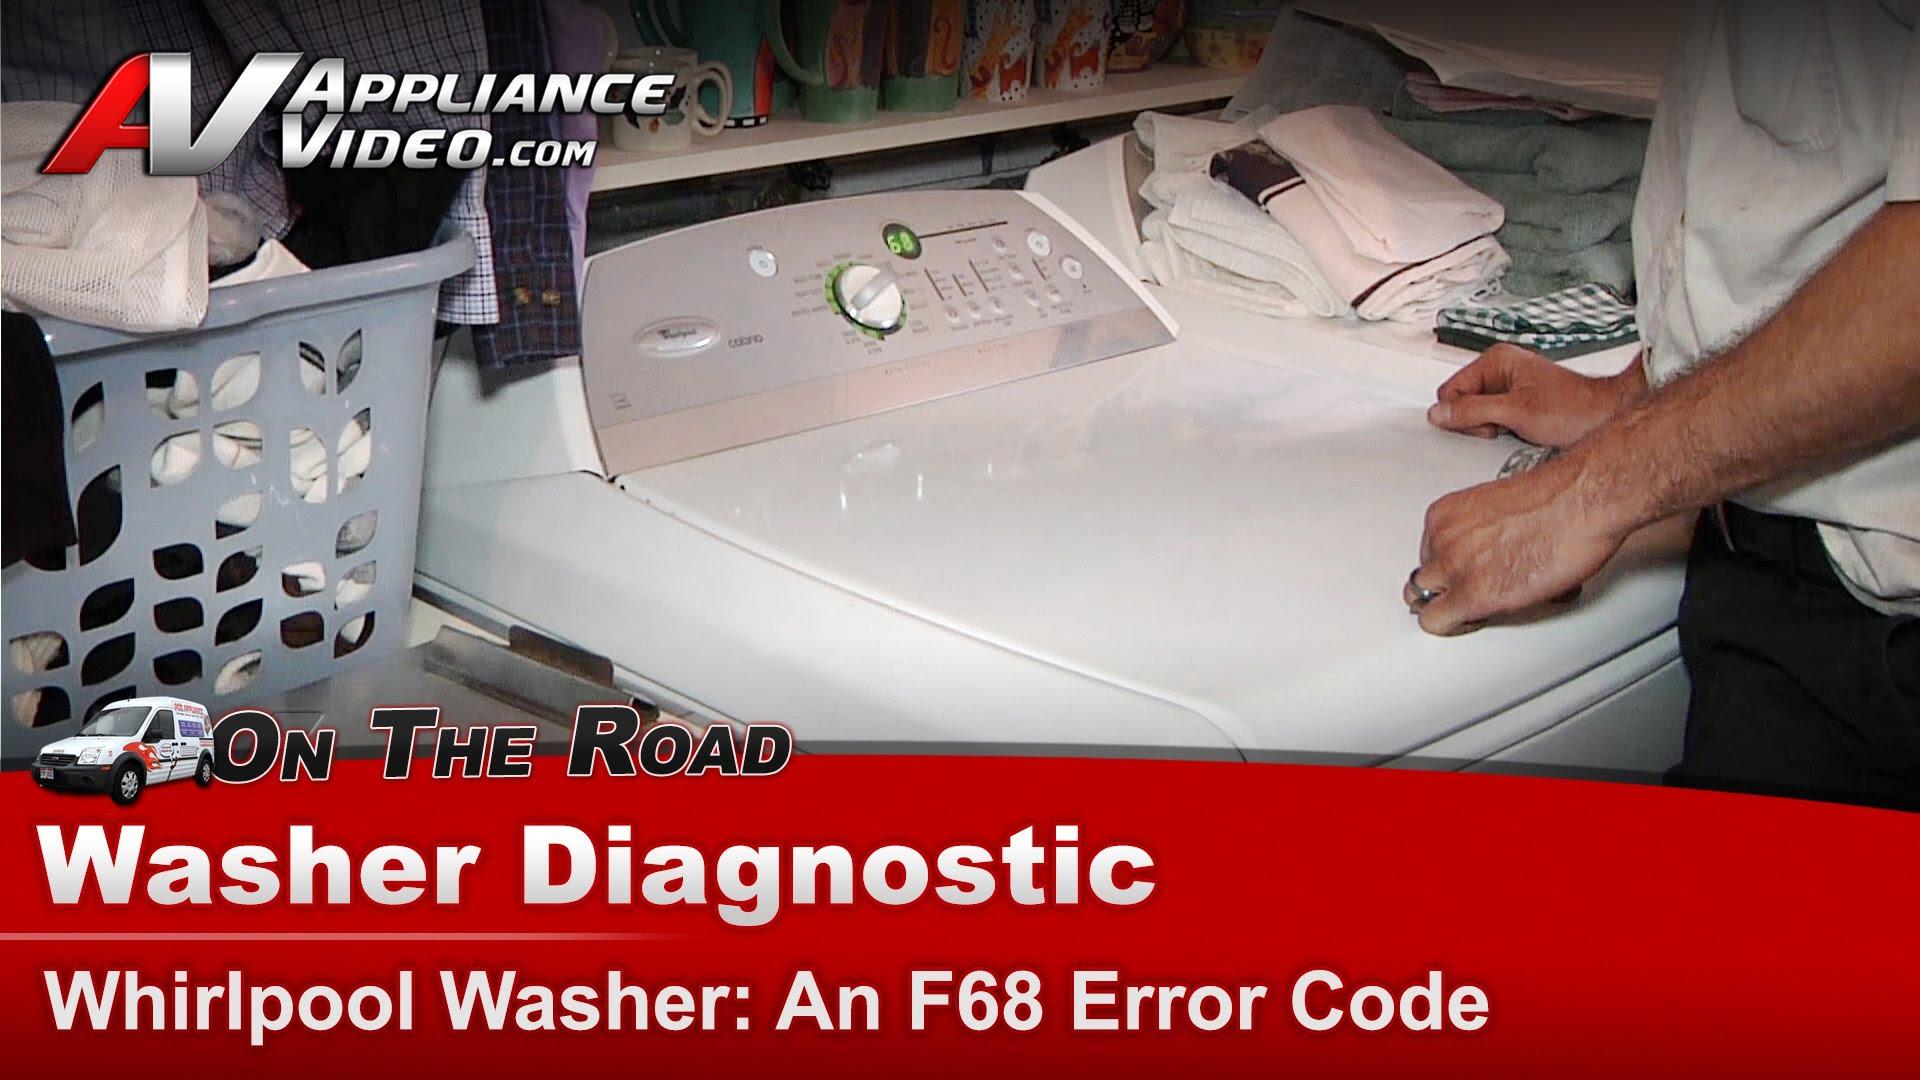 Whirlpool WTW6400SW2 Washer Diagnostic – An f68 error code